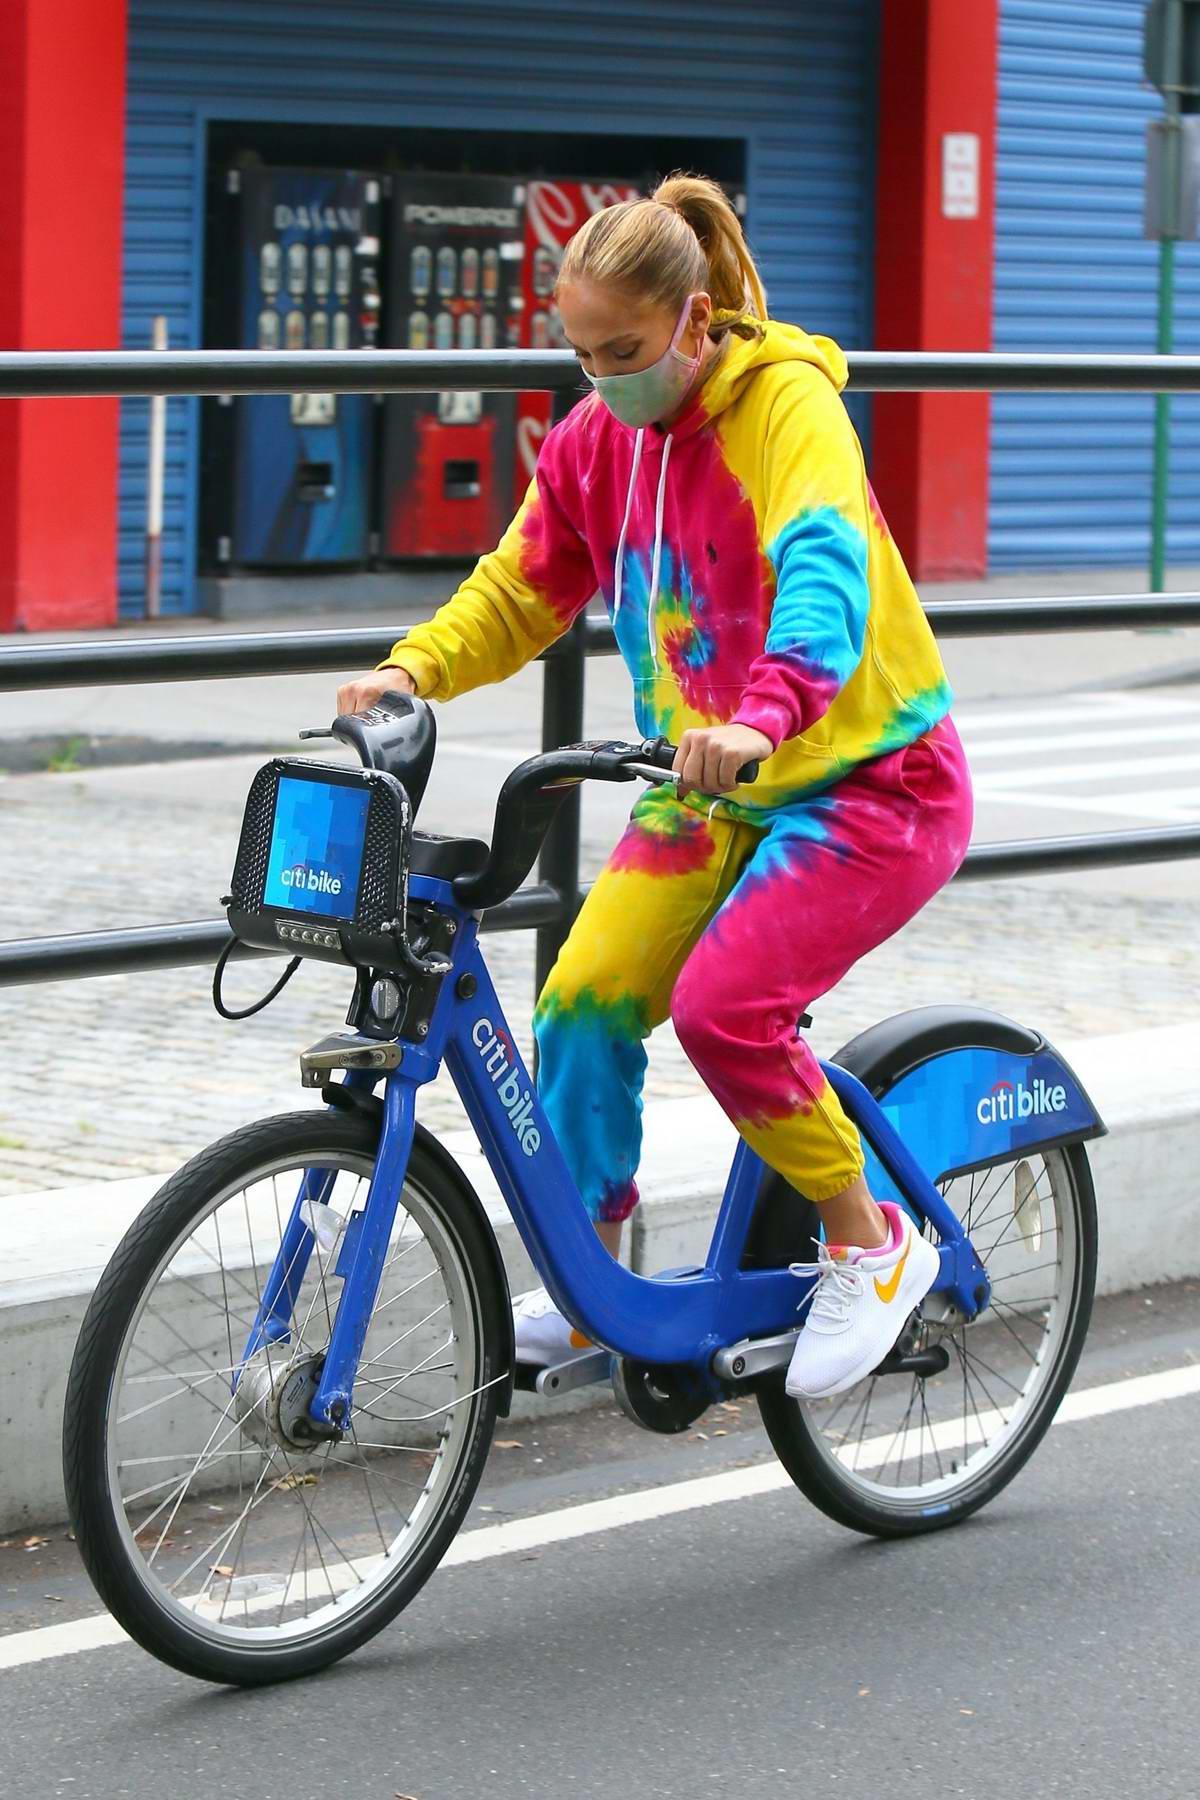 Jennifer Lopez wears colorful tie-dye sweats while riding a City bike in New York City